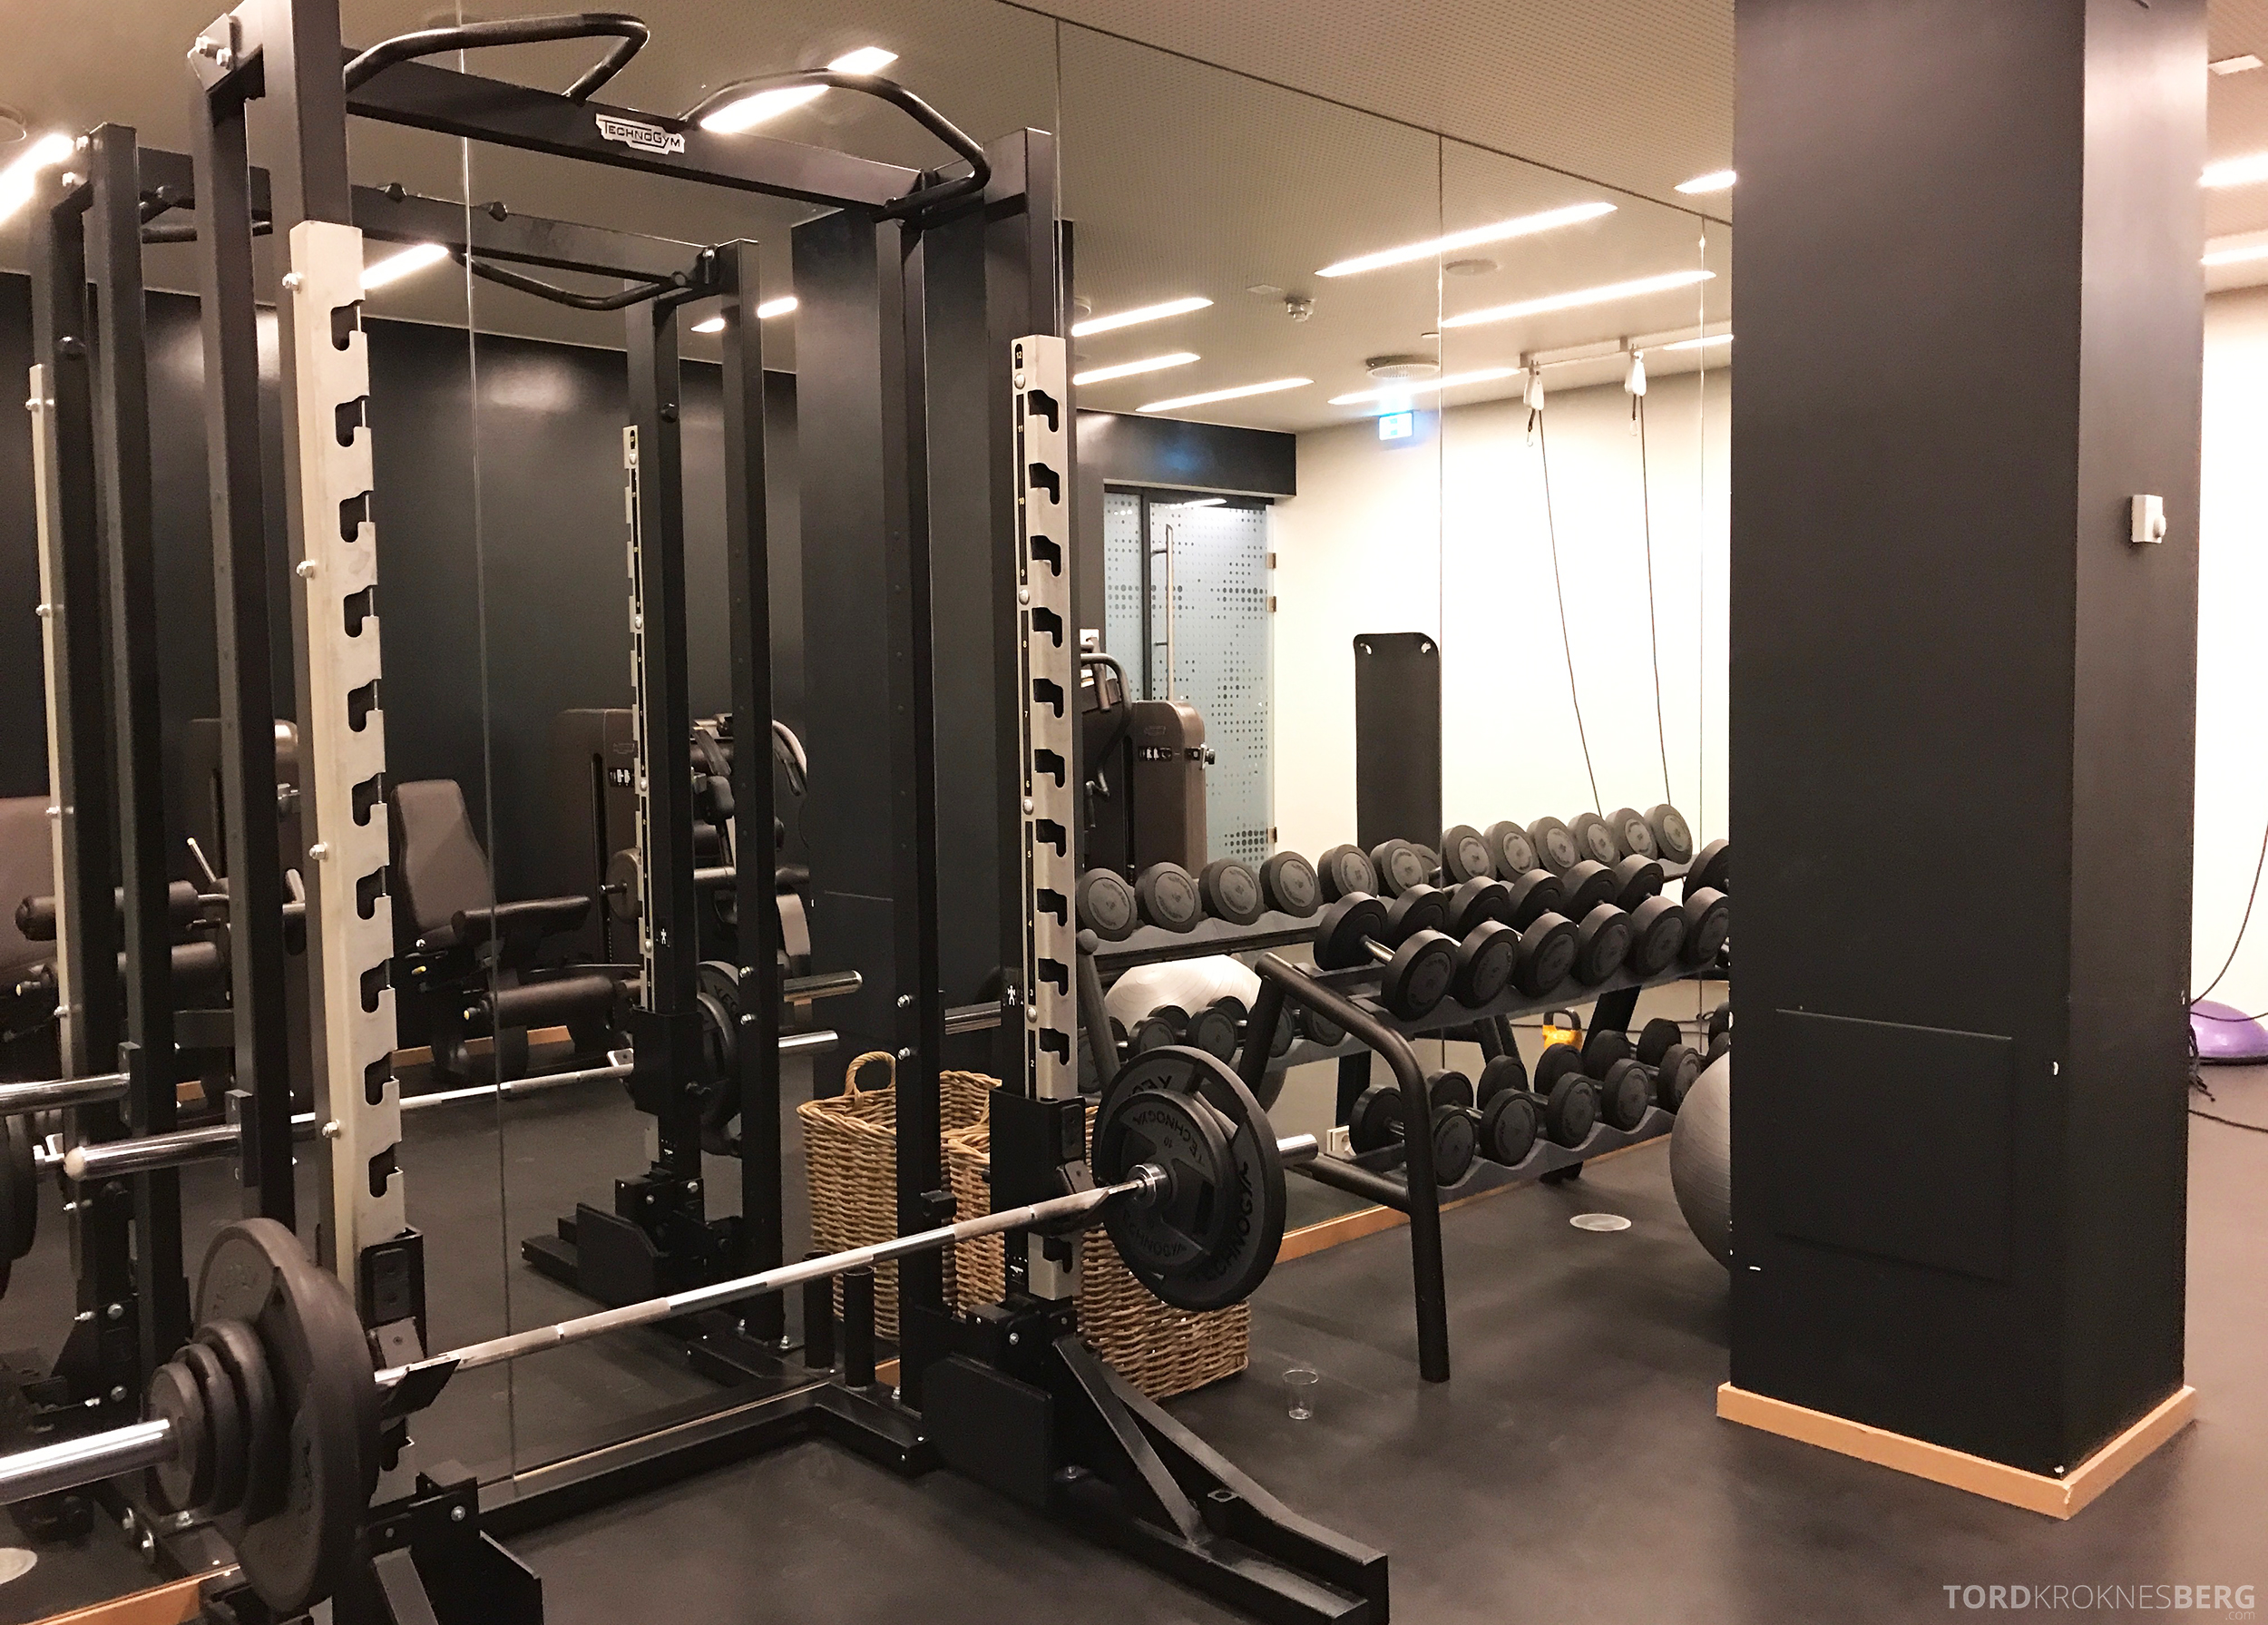 The Thief Tjuvholmen gym vekter